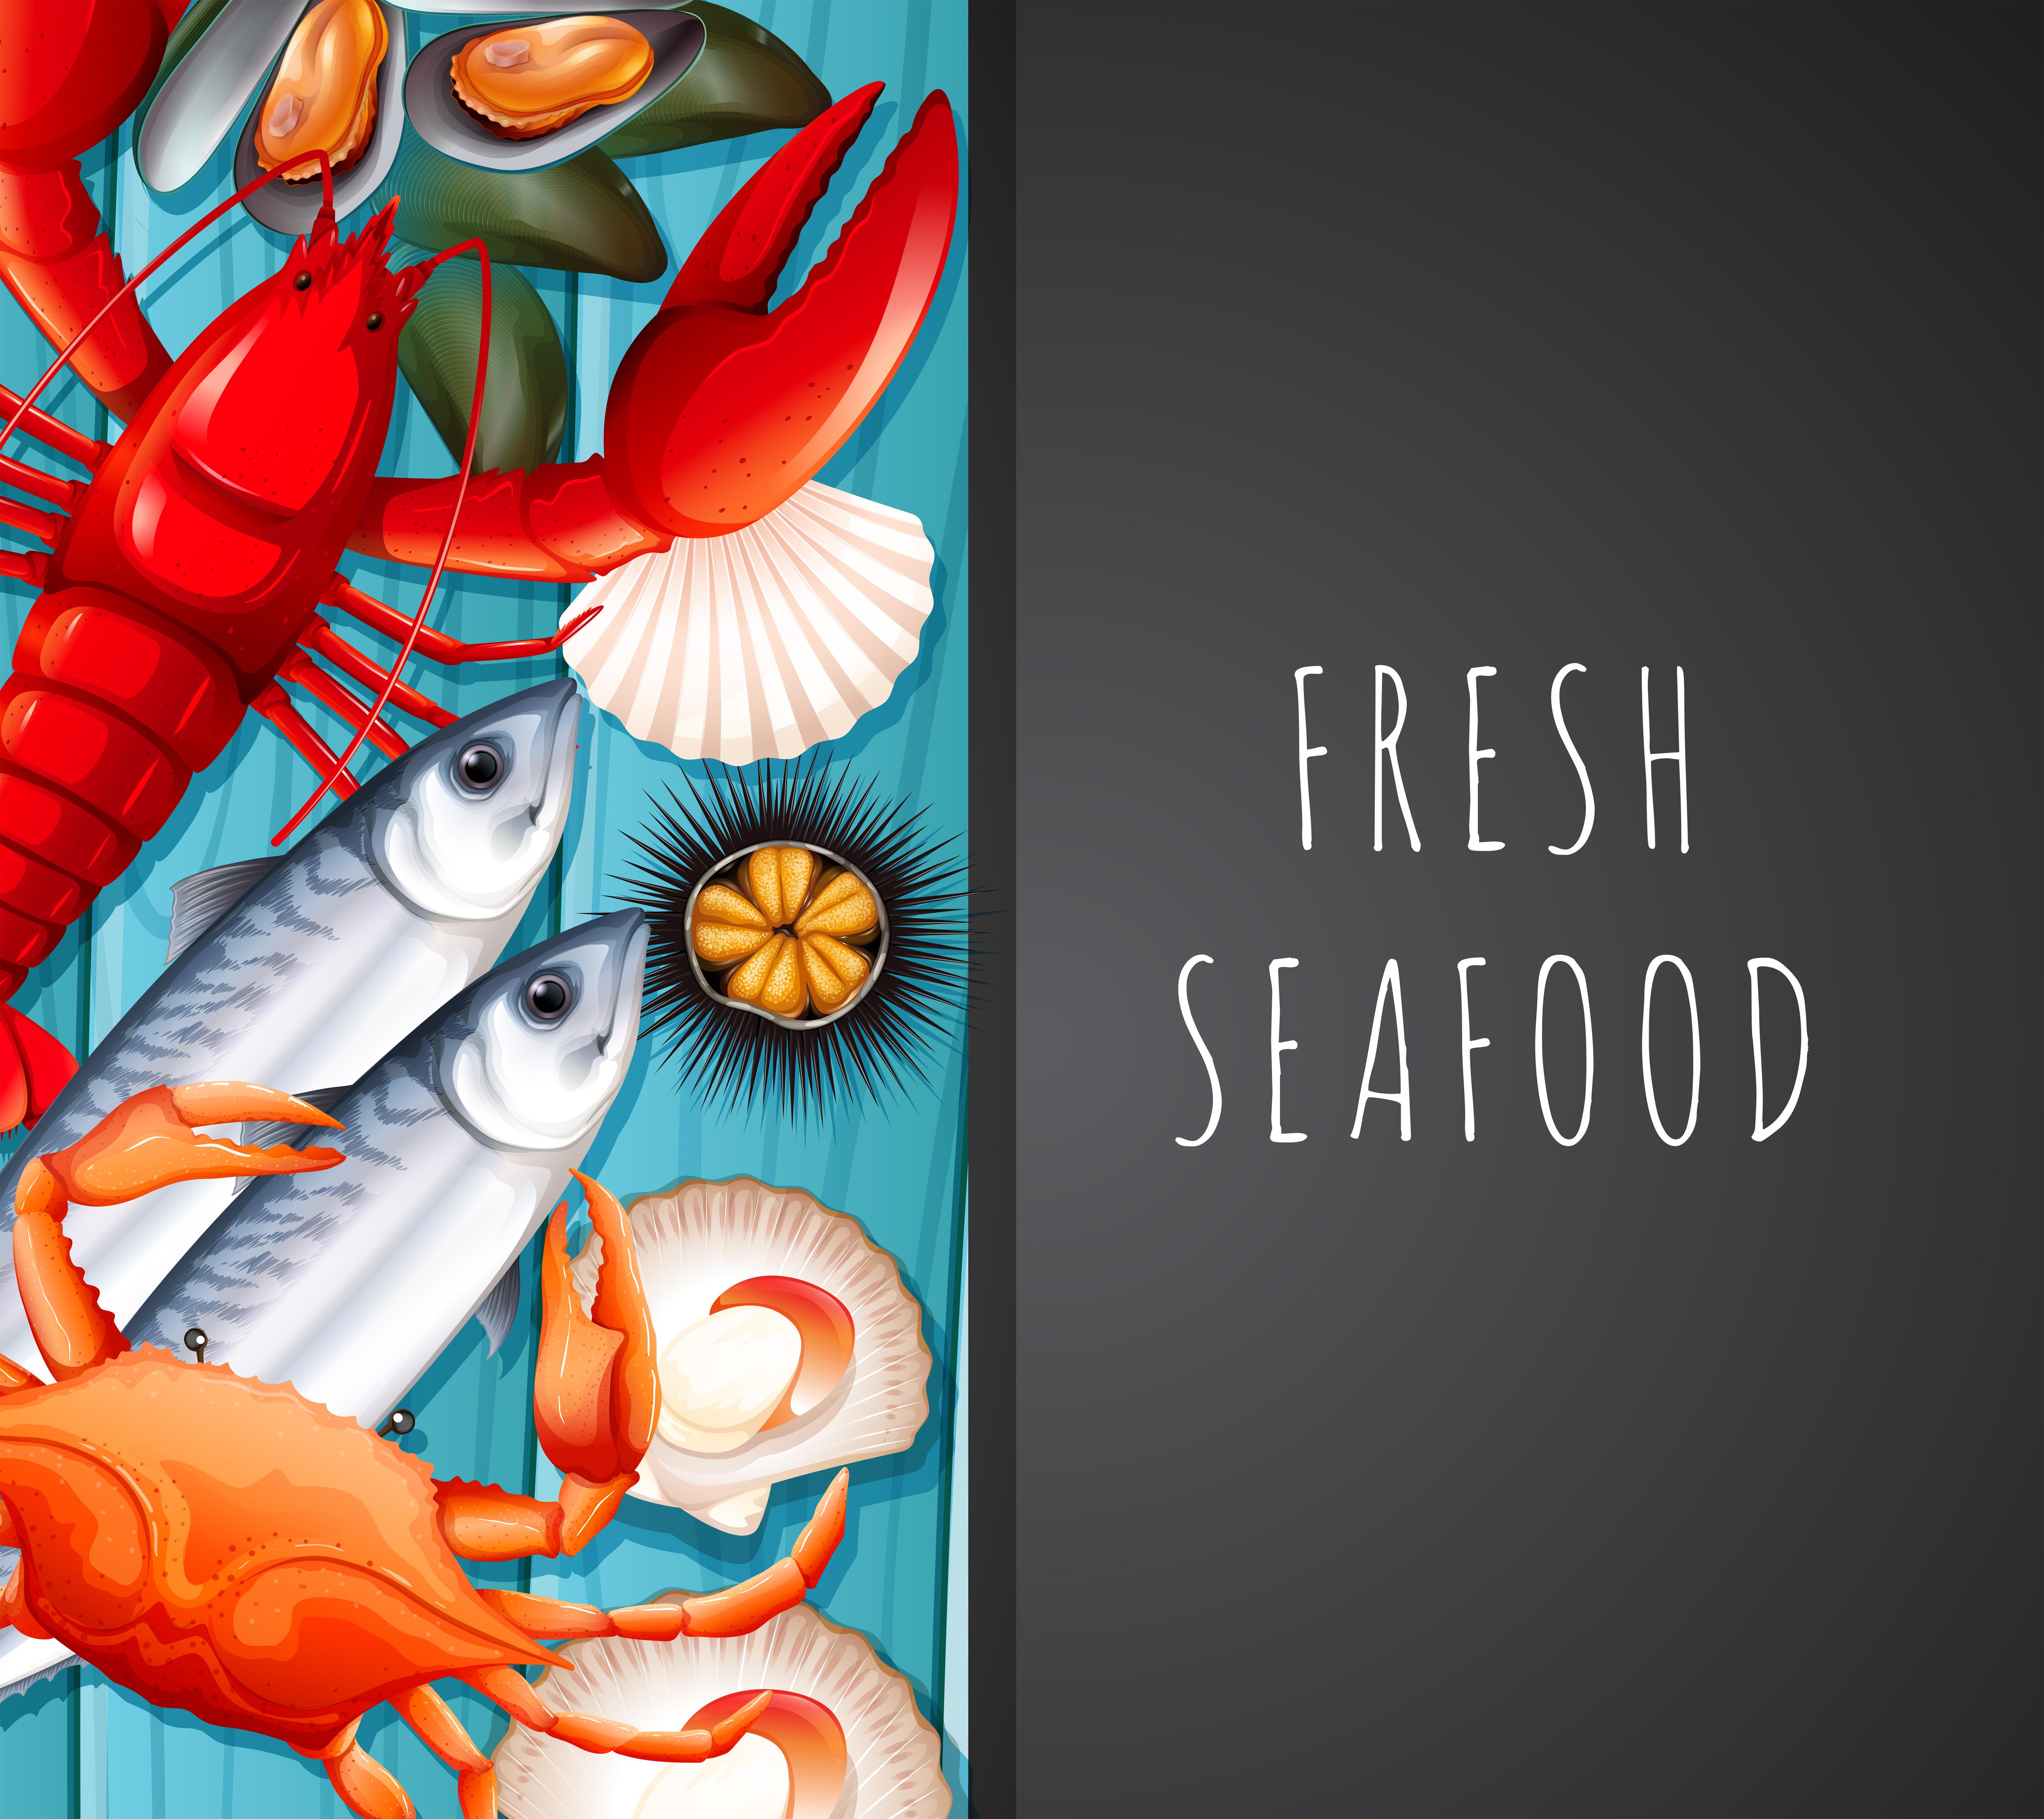 Seafood Restaurant Free Vector Art